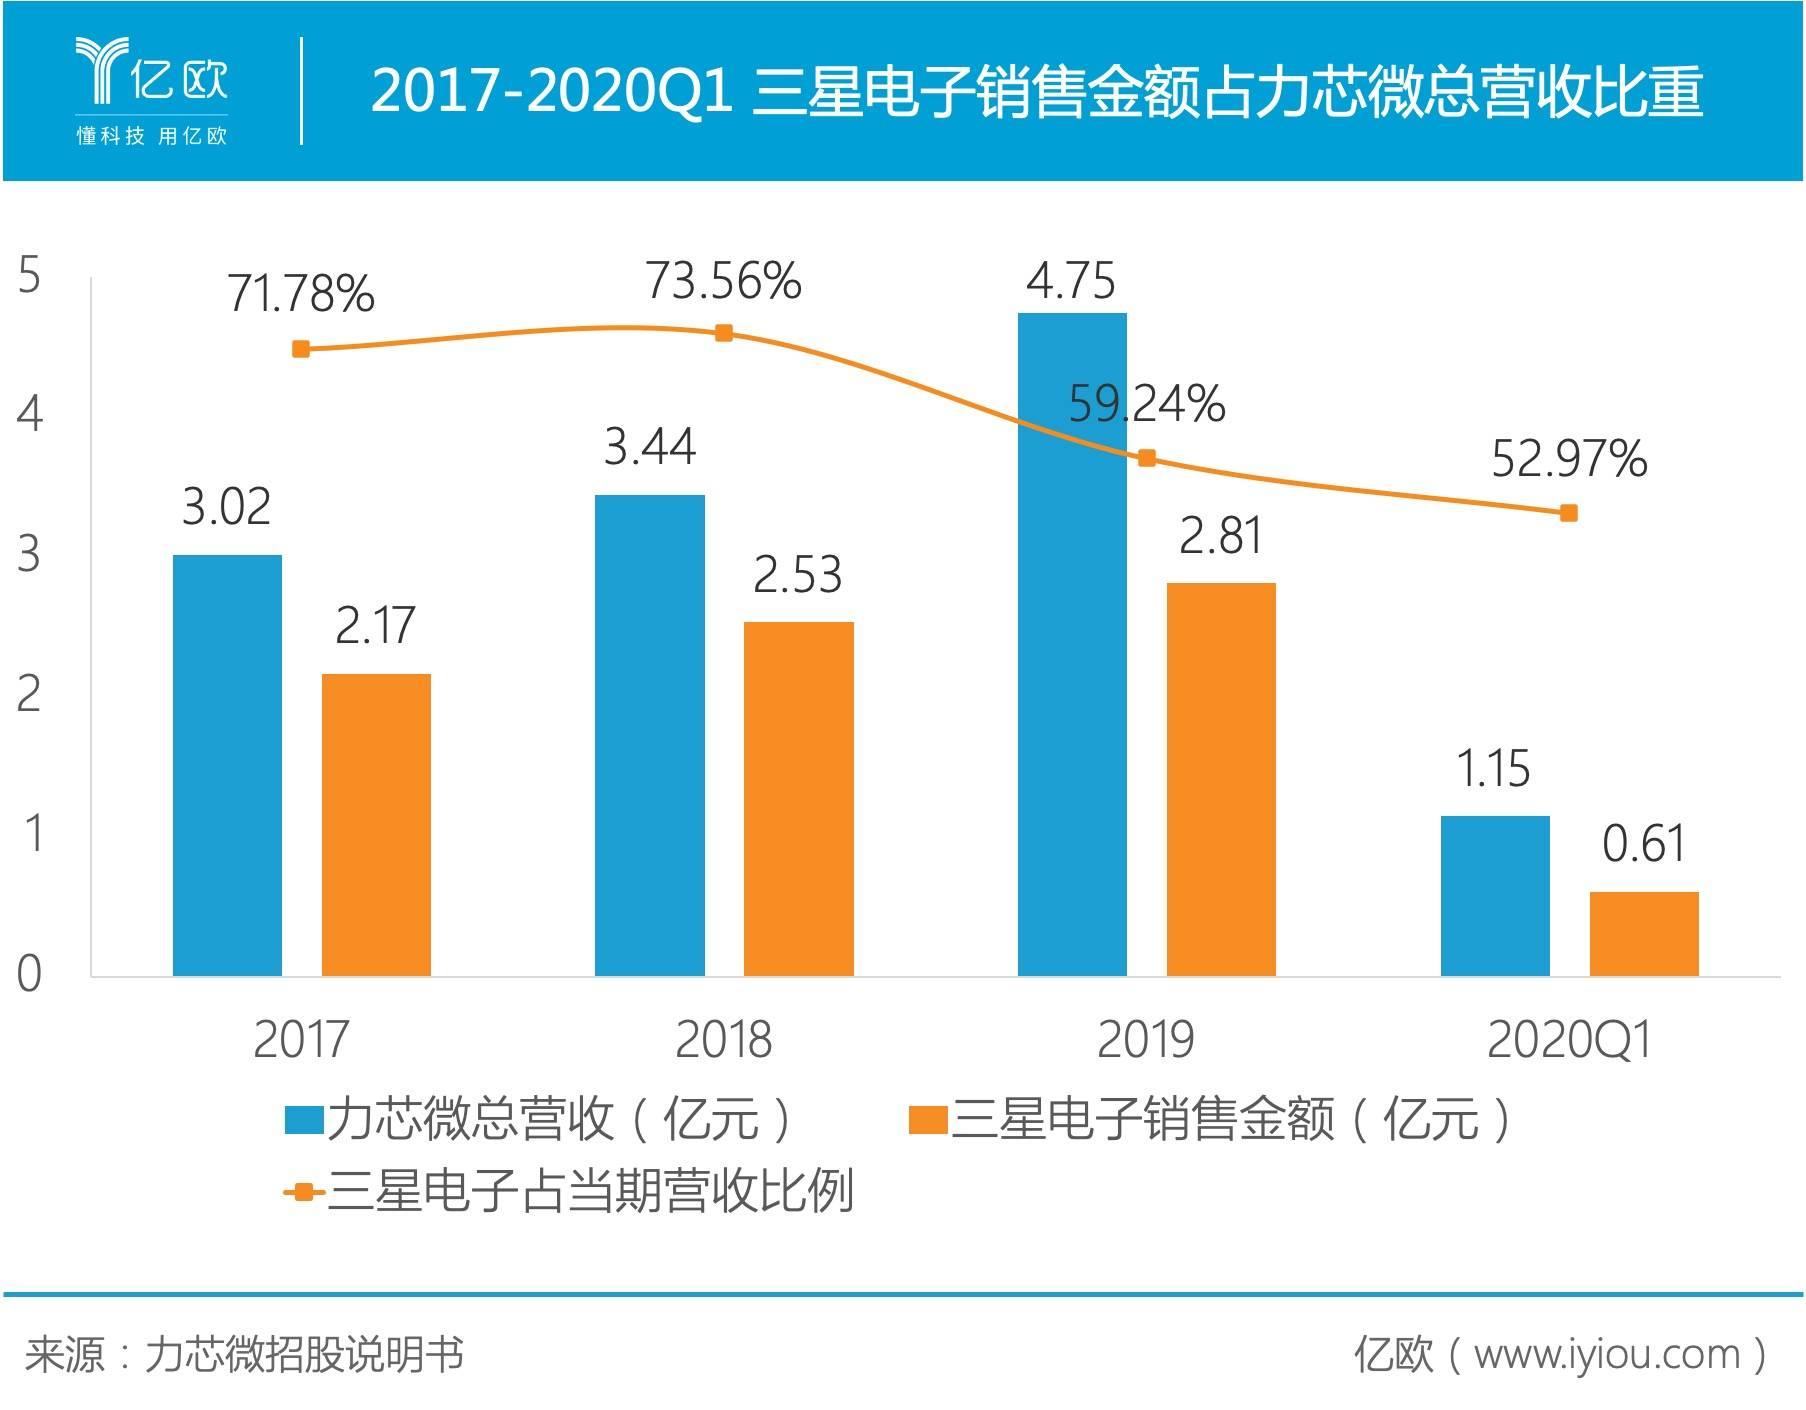 2017-2020Q1 三星电子销售金额占力芯微总营收比重.PNG